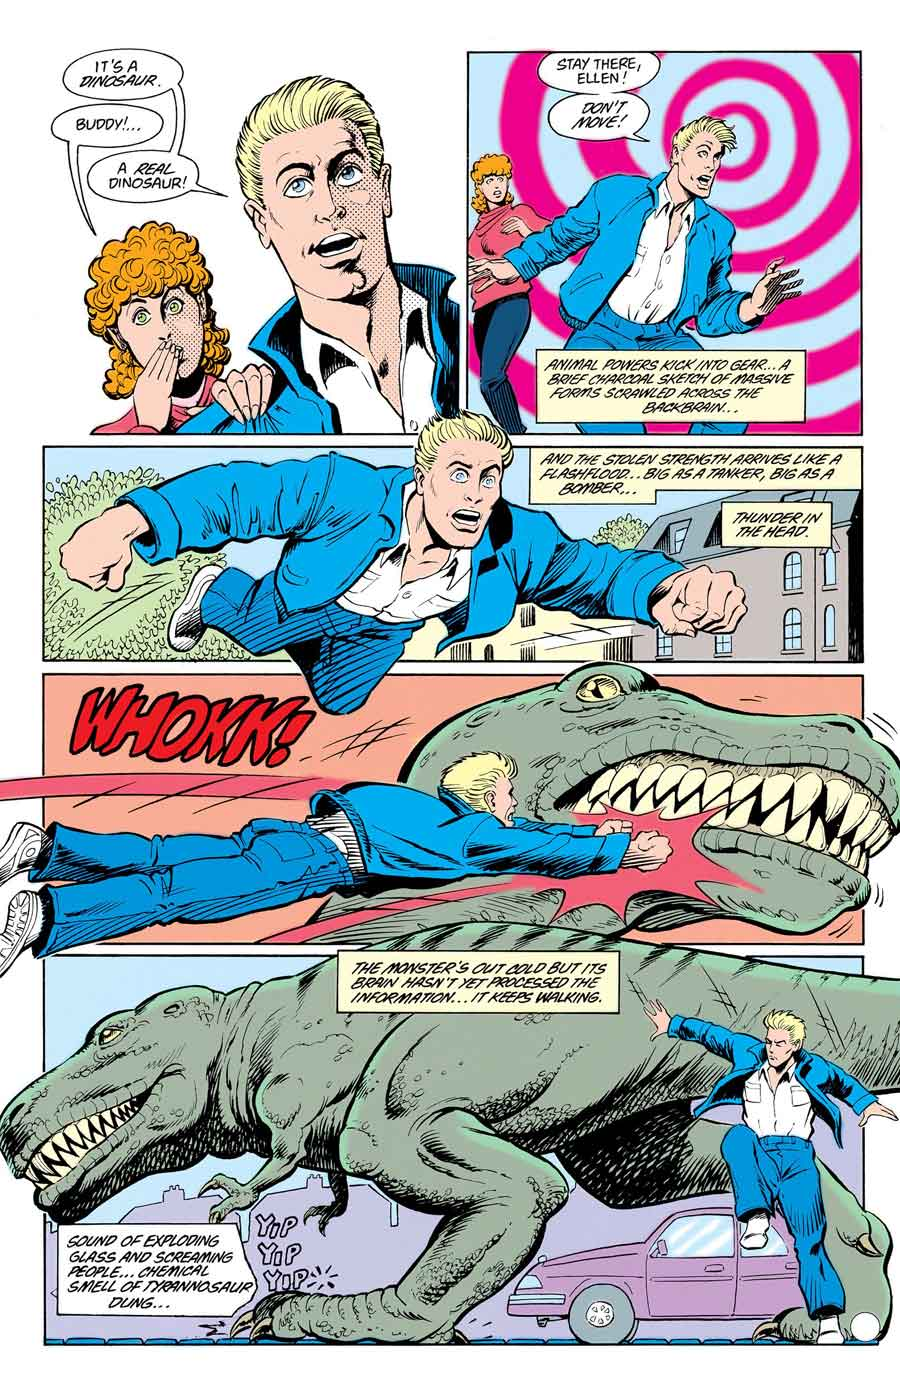 Animal Man #16 by Grant Morrison, Chas Truog and Doug Hazlewood